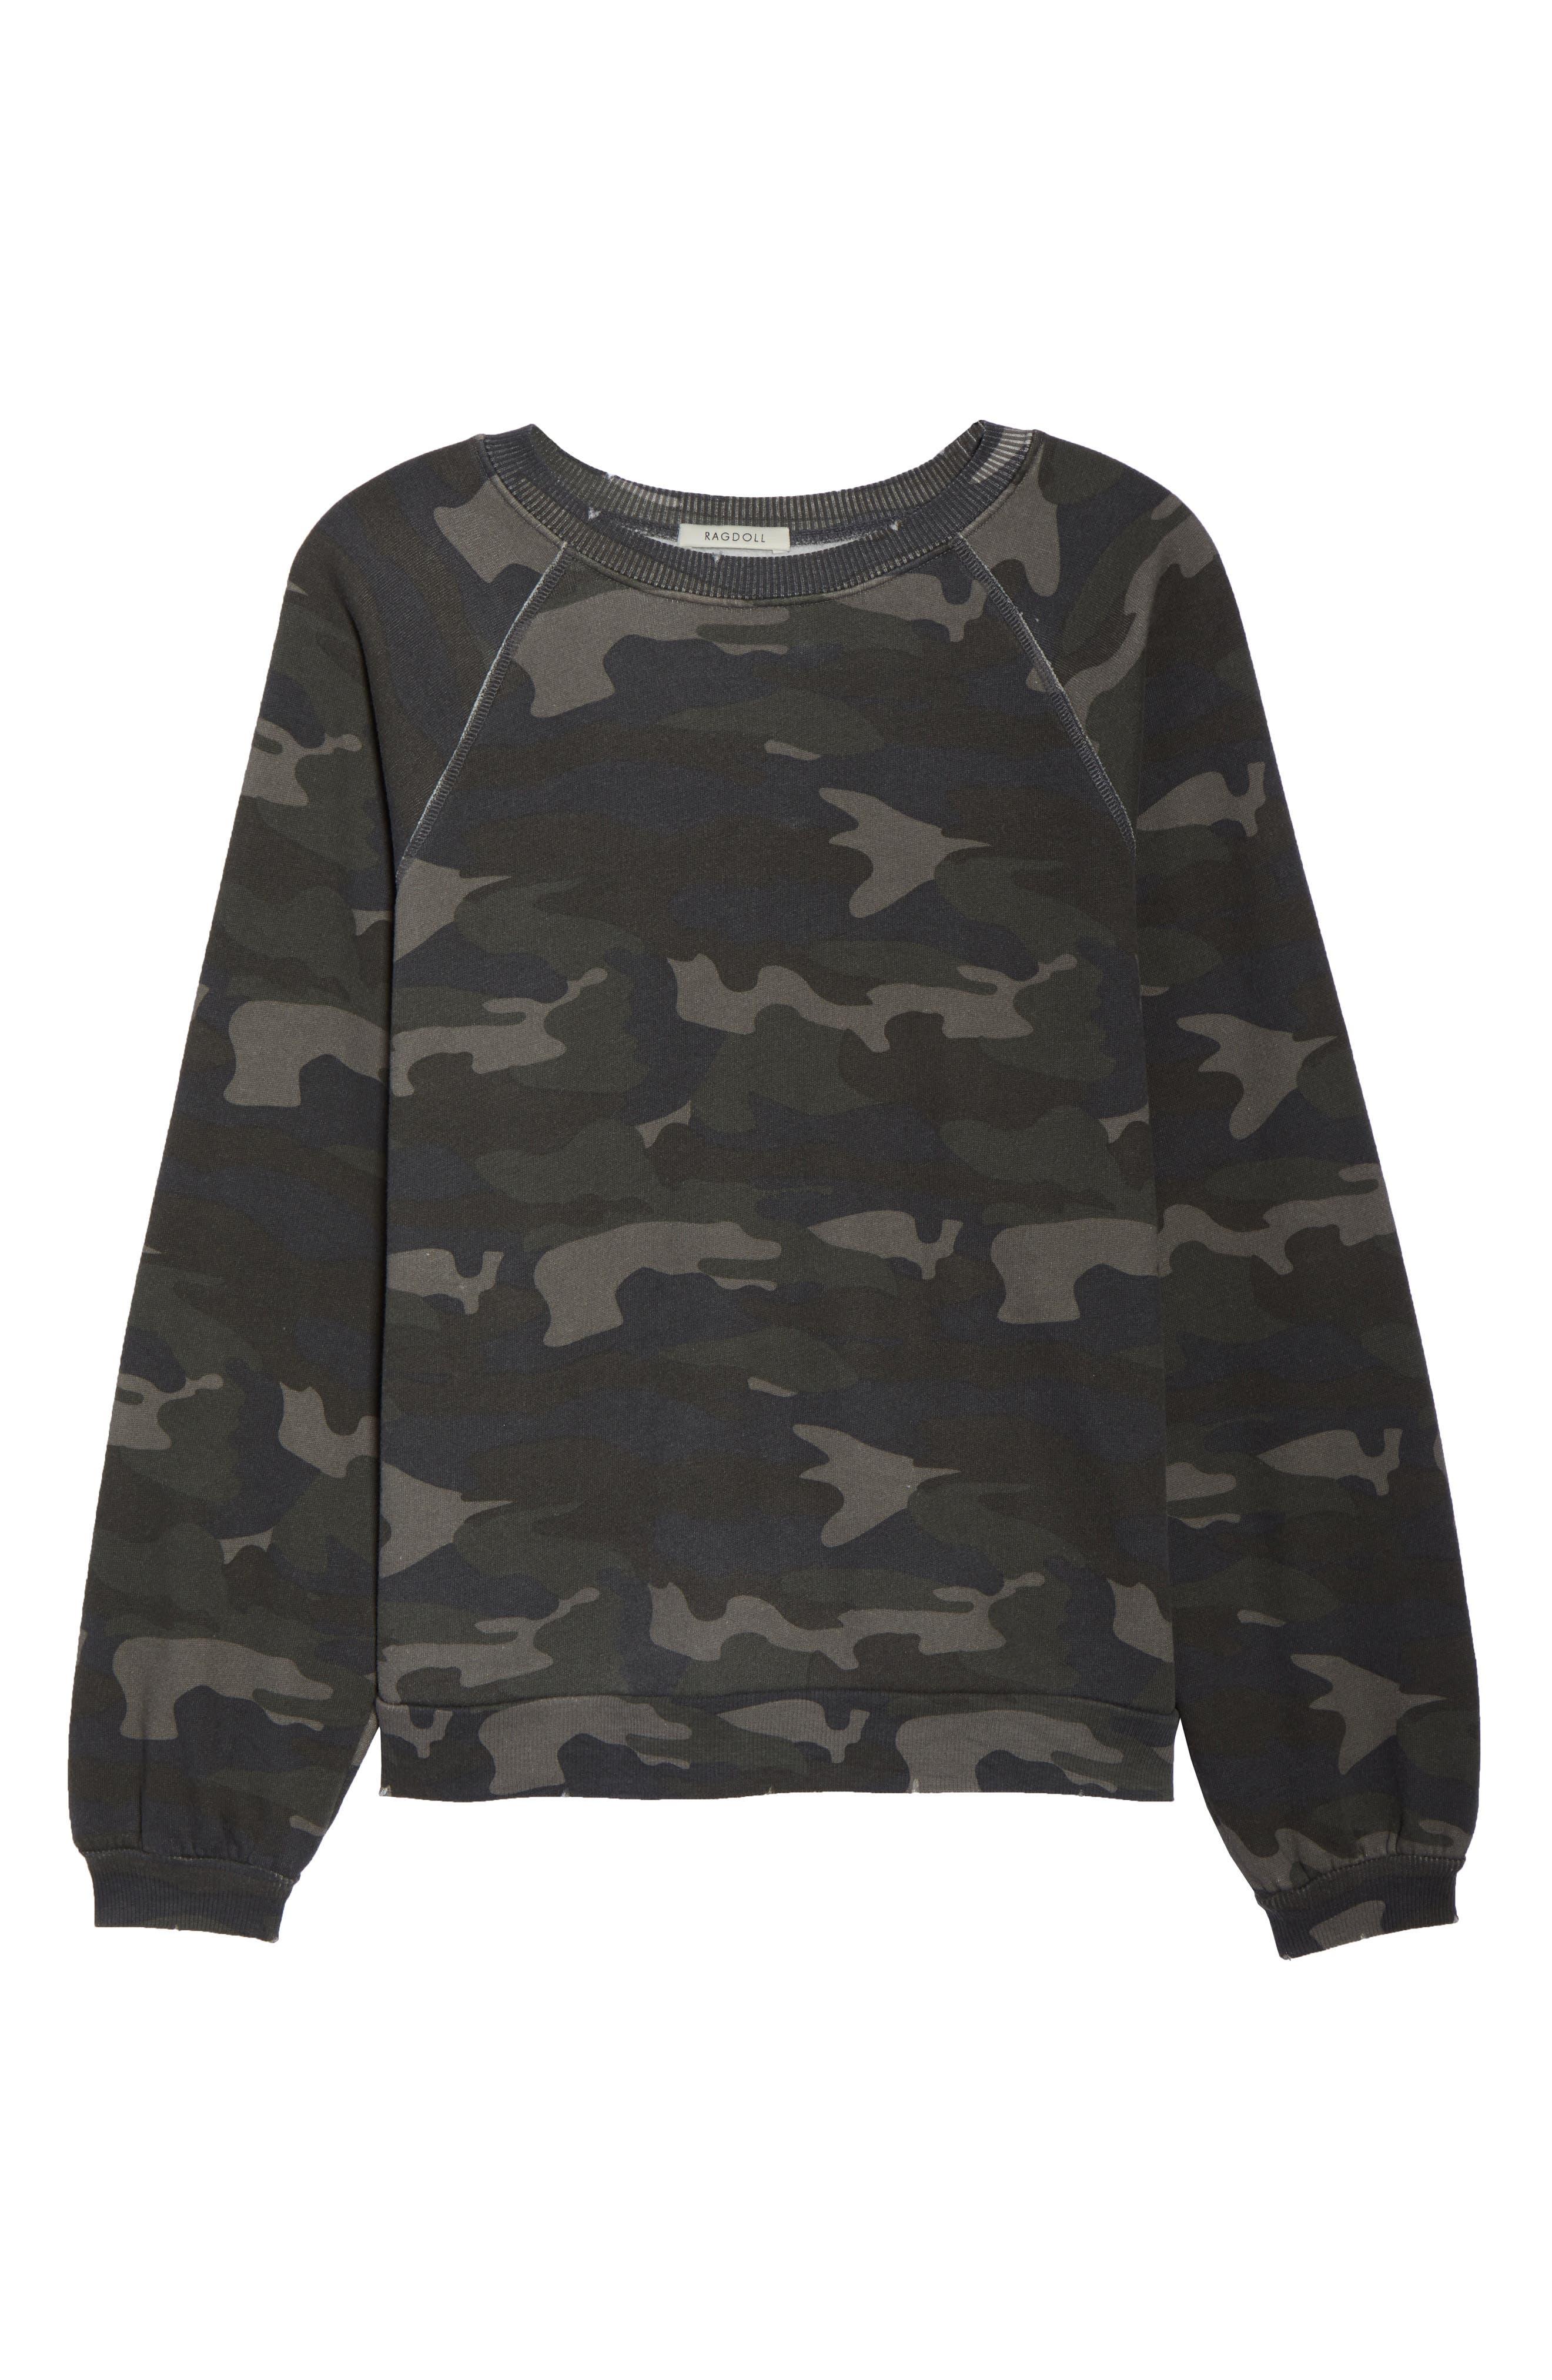 RAGDOLL, Camo Oversize Sweatshirt, Alternate thumbnail 6, color, CAMO